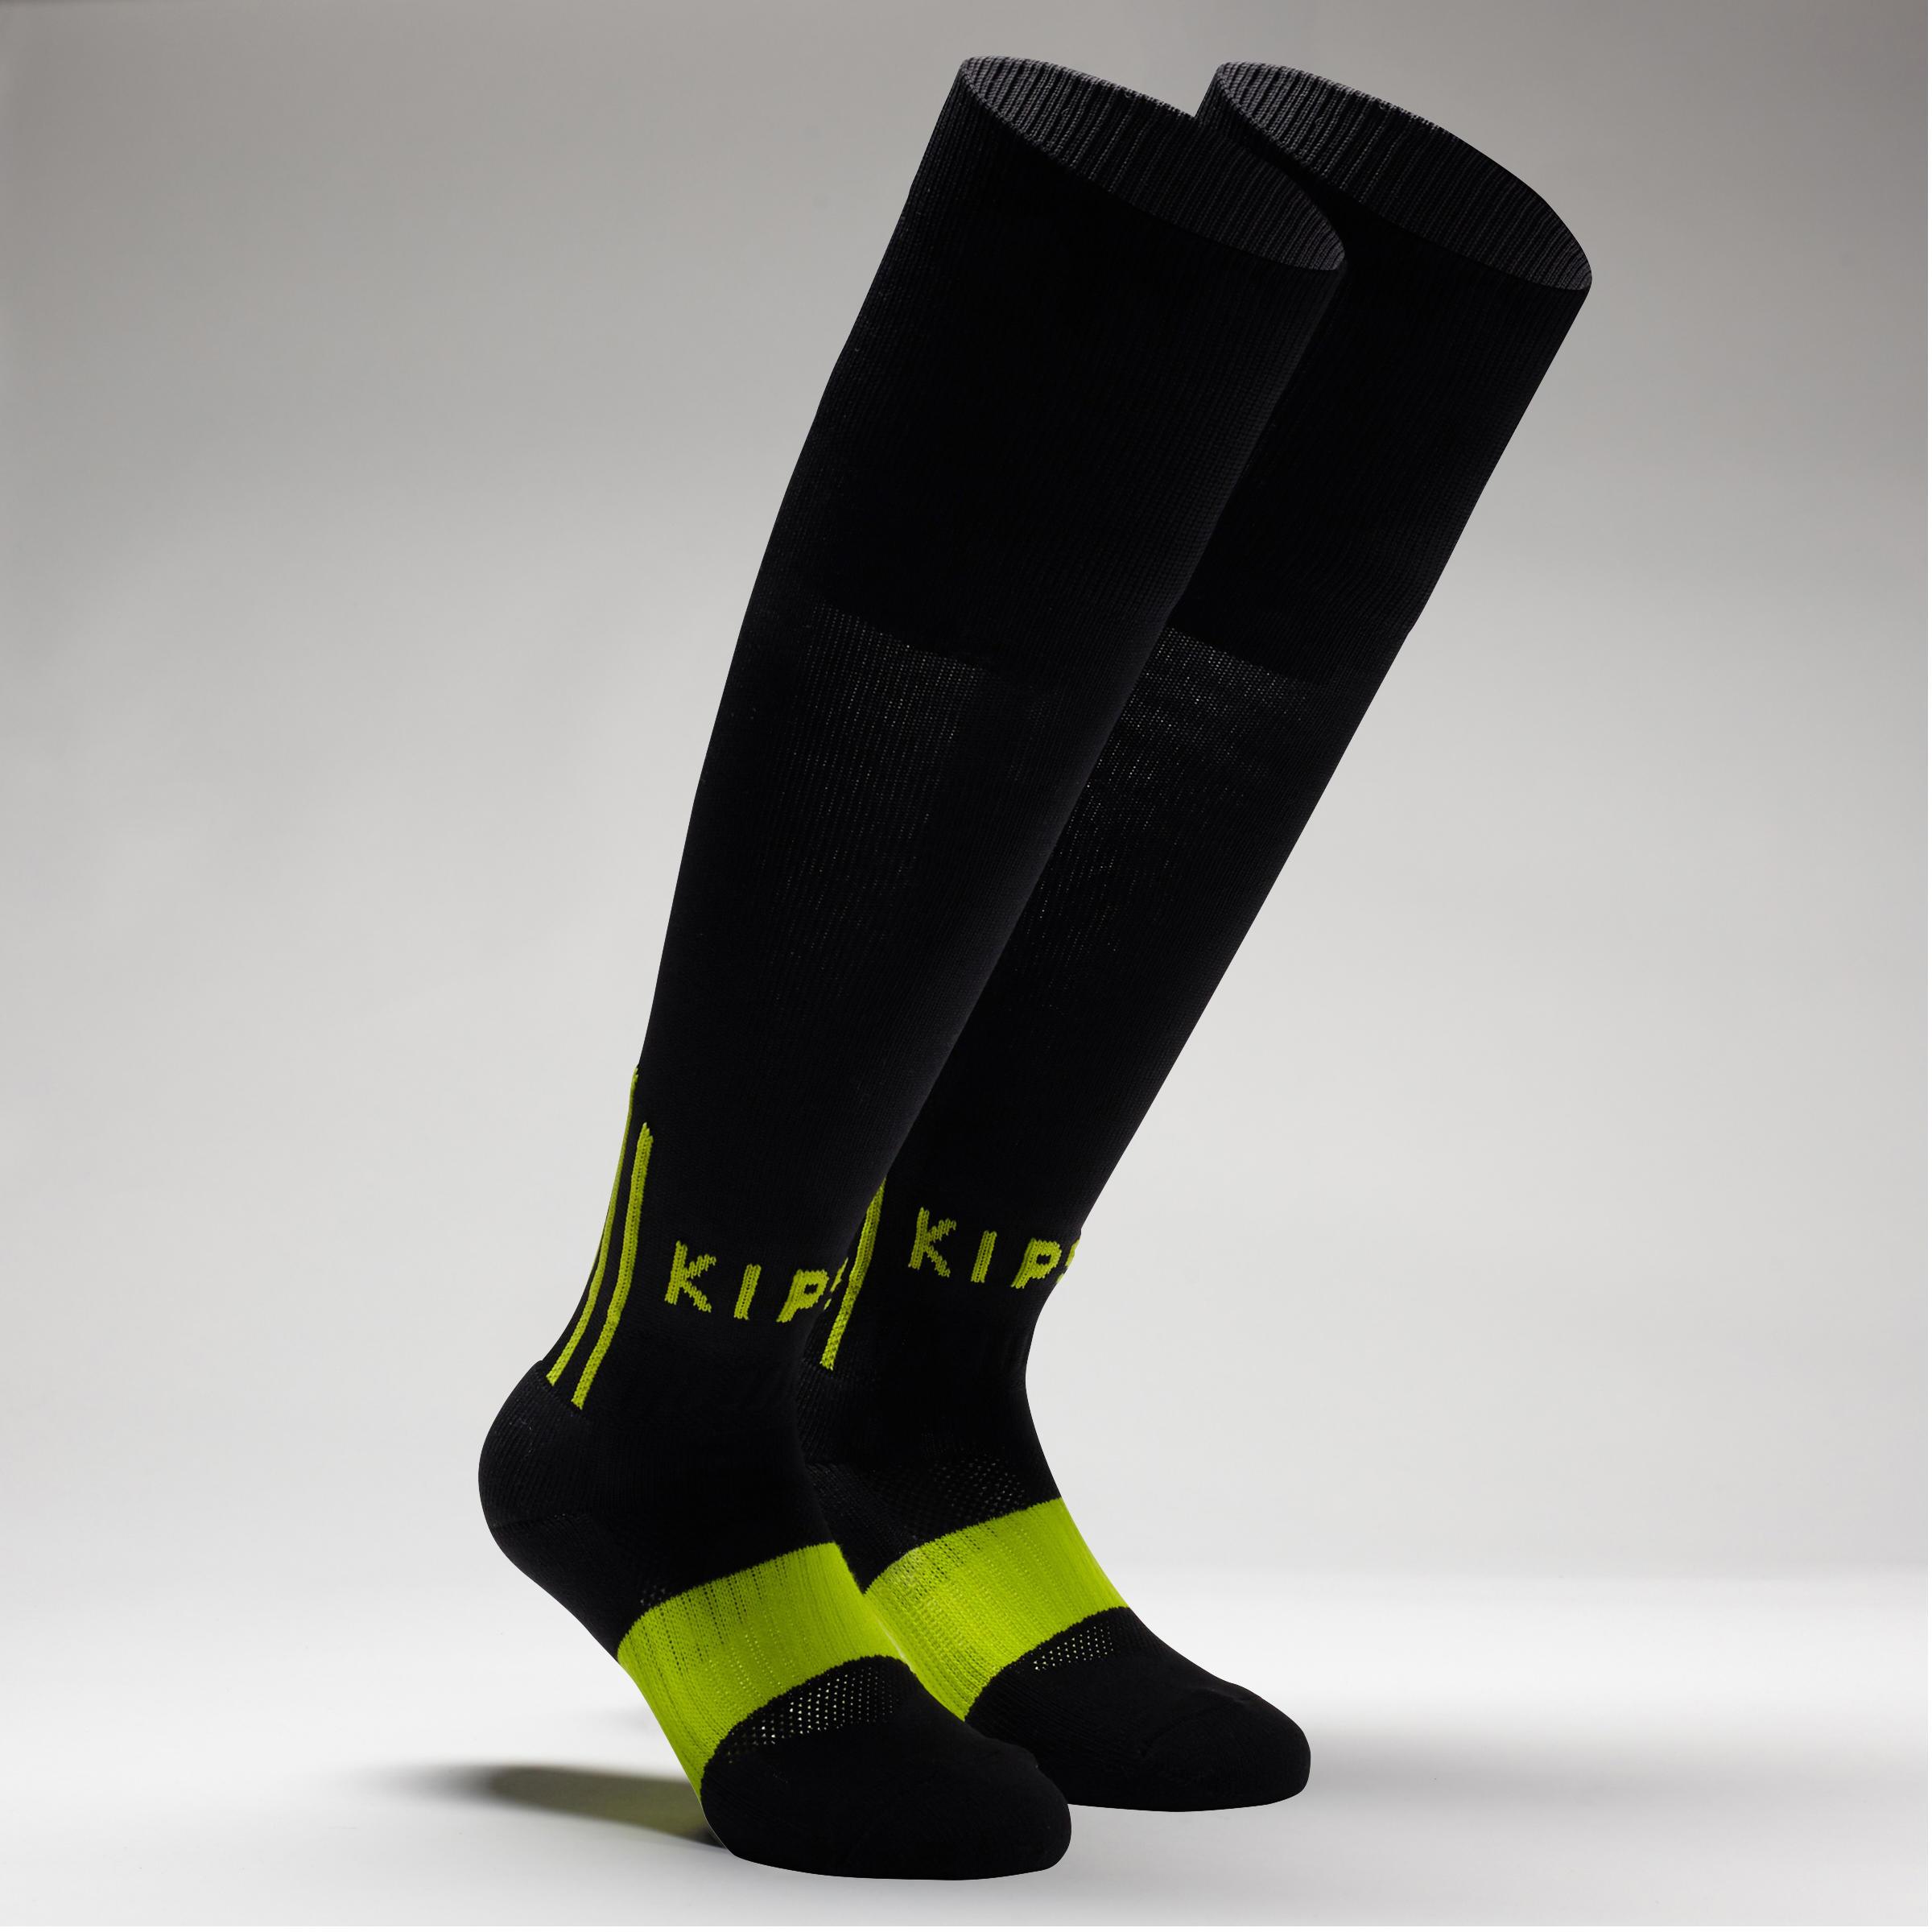 F500 Kids' Football Socks - Black/Neon Yellow